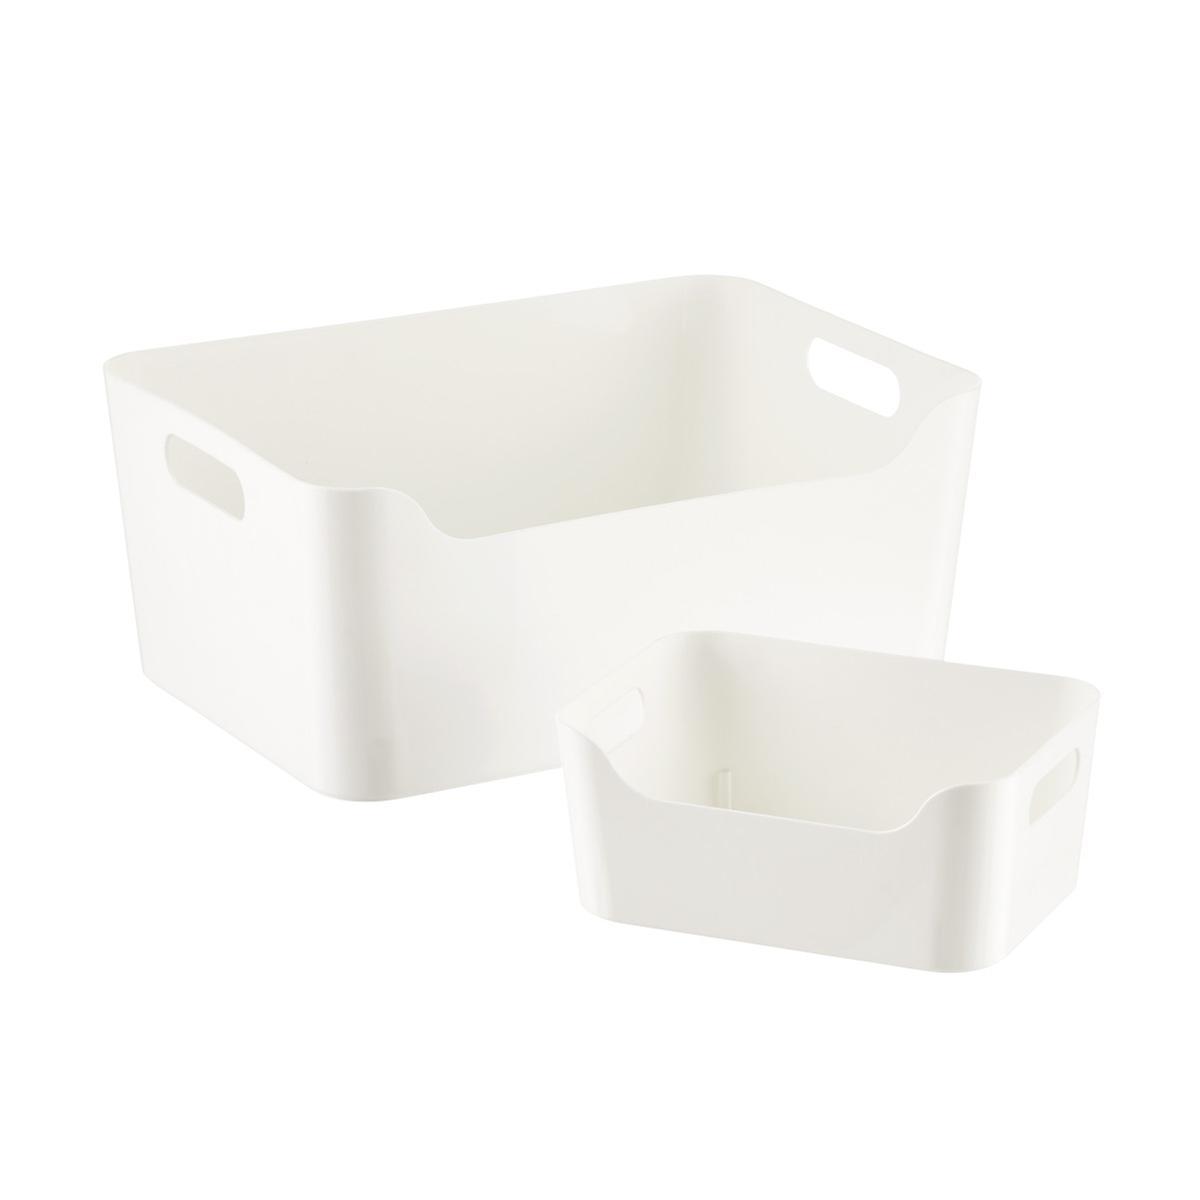 10071296g-plastic-storage-bin-white.jpg